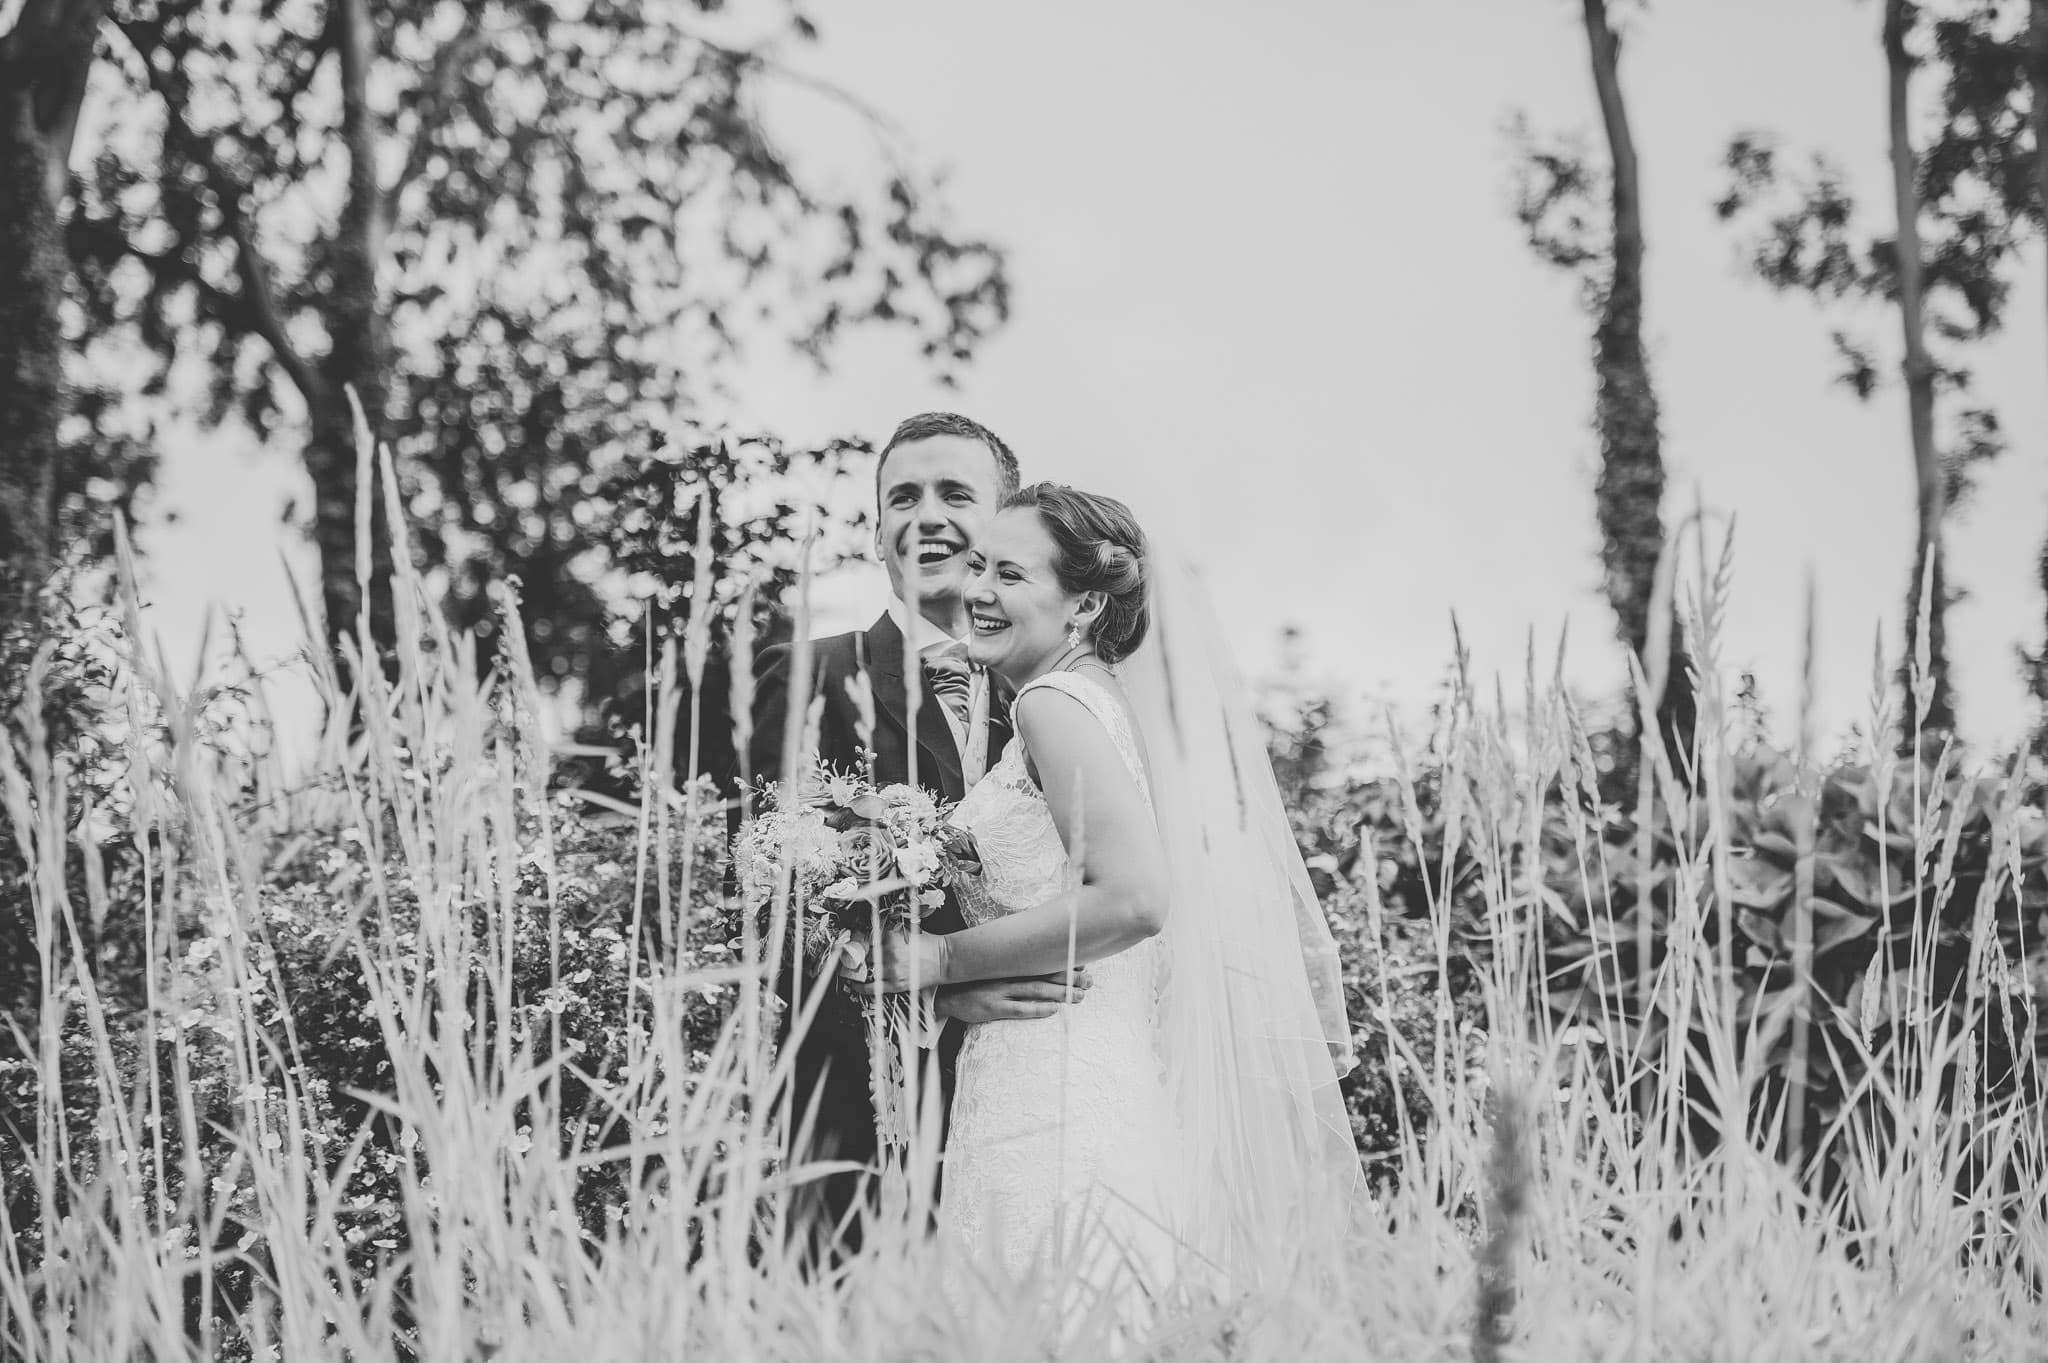 Wedding photography at Y Talbot Hotel in Tregaron, Wales   Tina + Phil 52